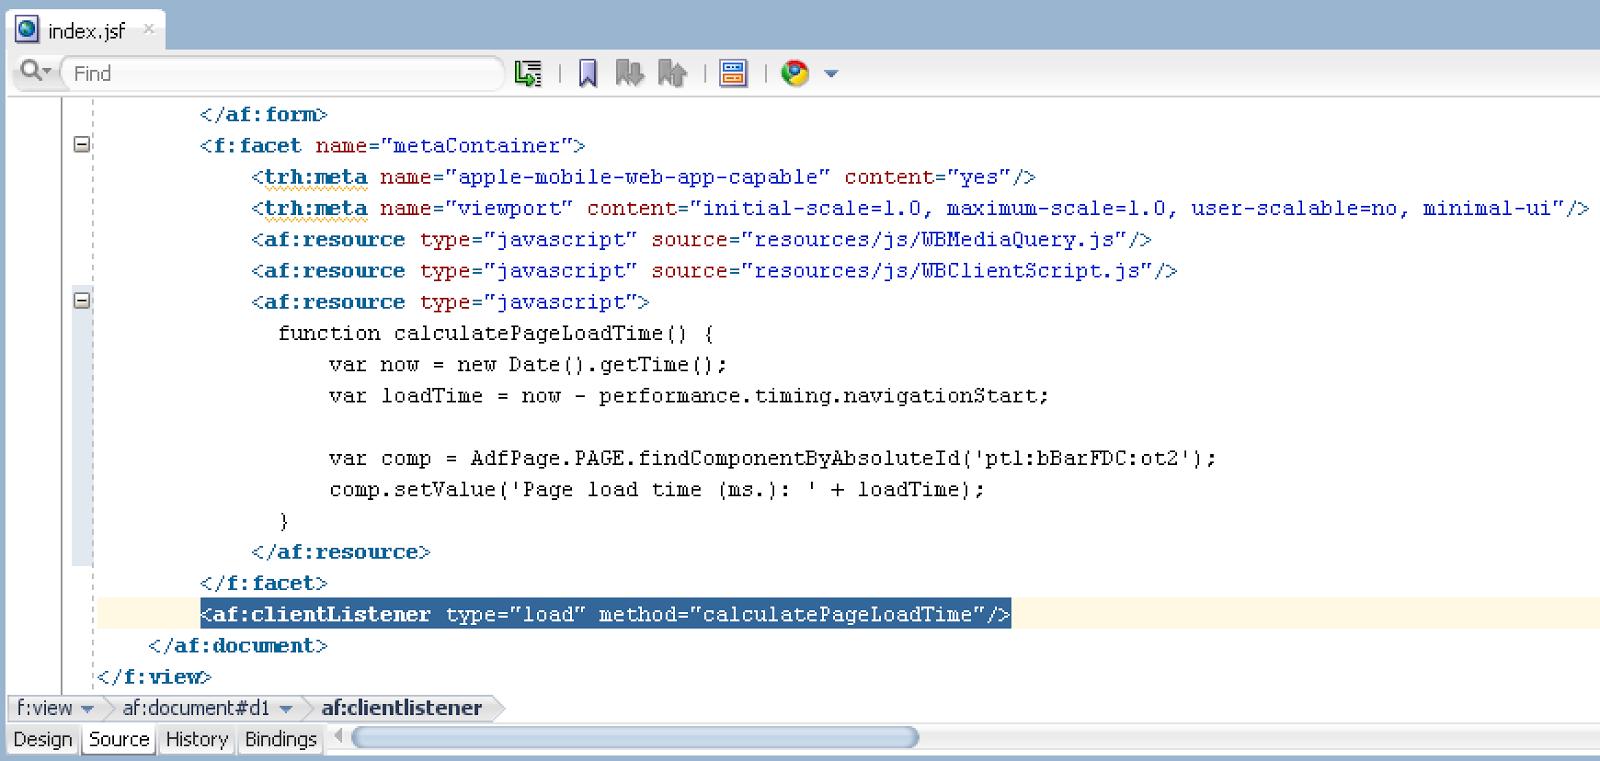 Andrejus Baranovskis Blog: Monitoring Page Load Time on ADF UI